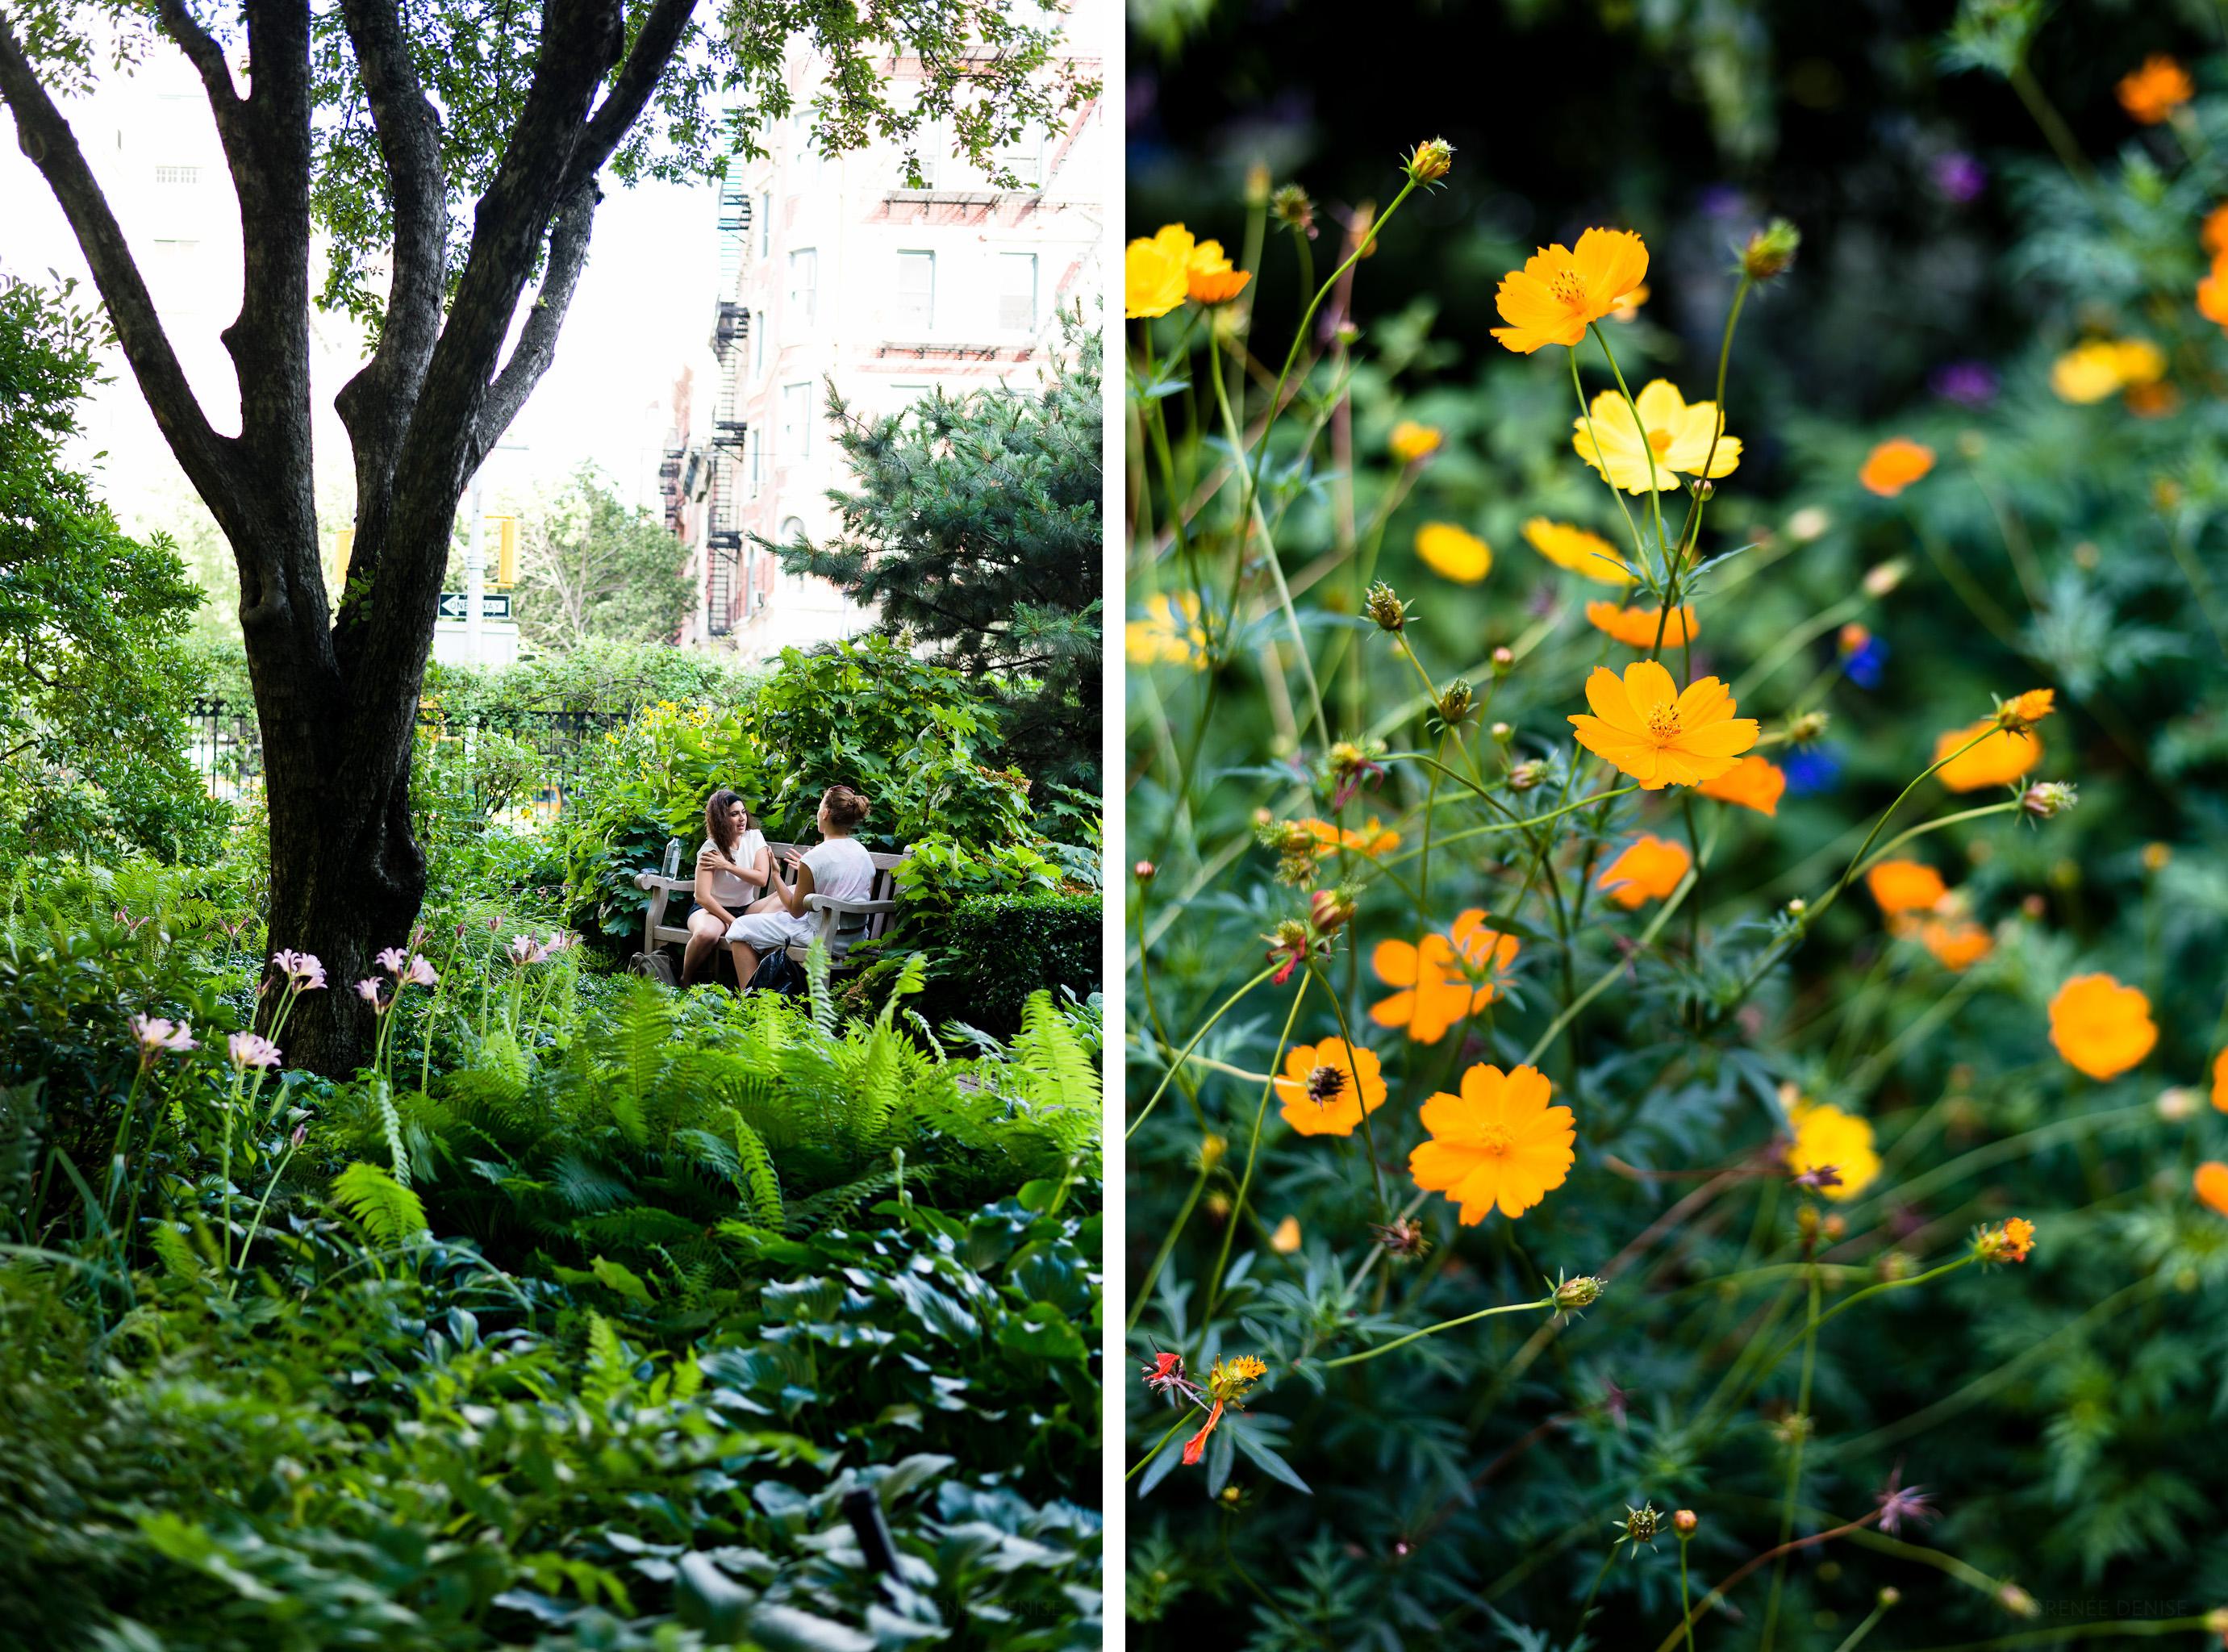 two-gardens-1-flavorsoflight